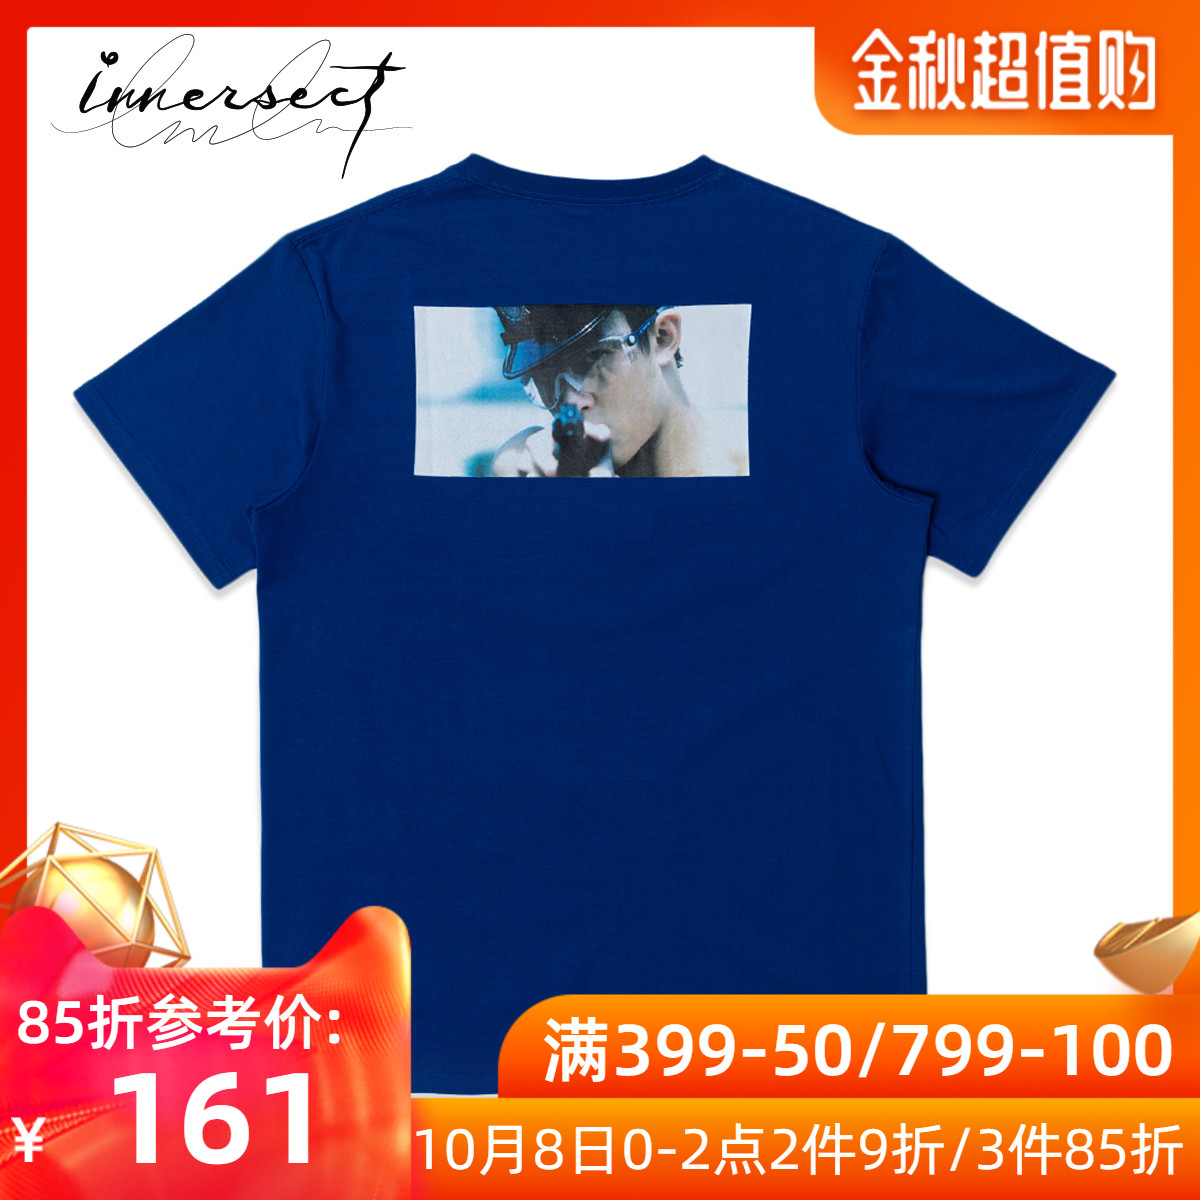 innersect潮牌4pk无间道夏季t恤(用190元券)